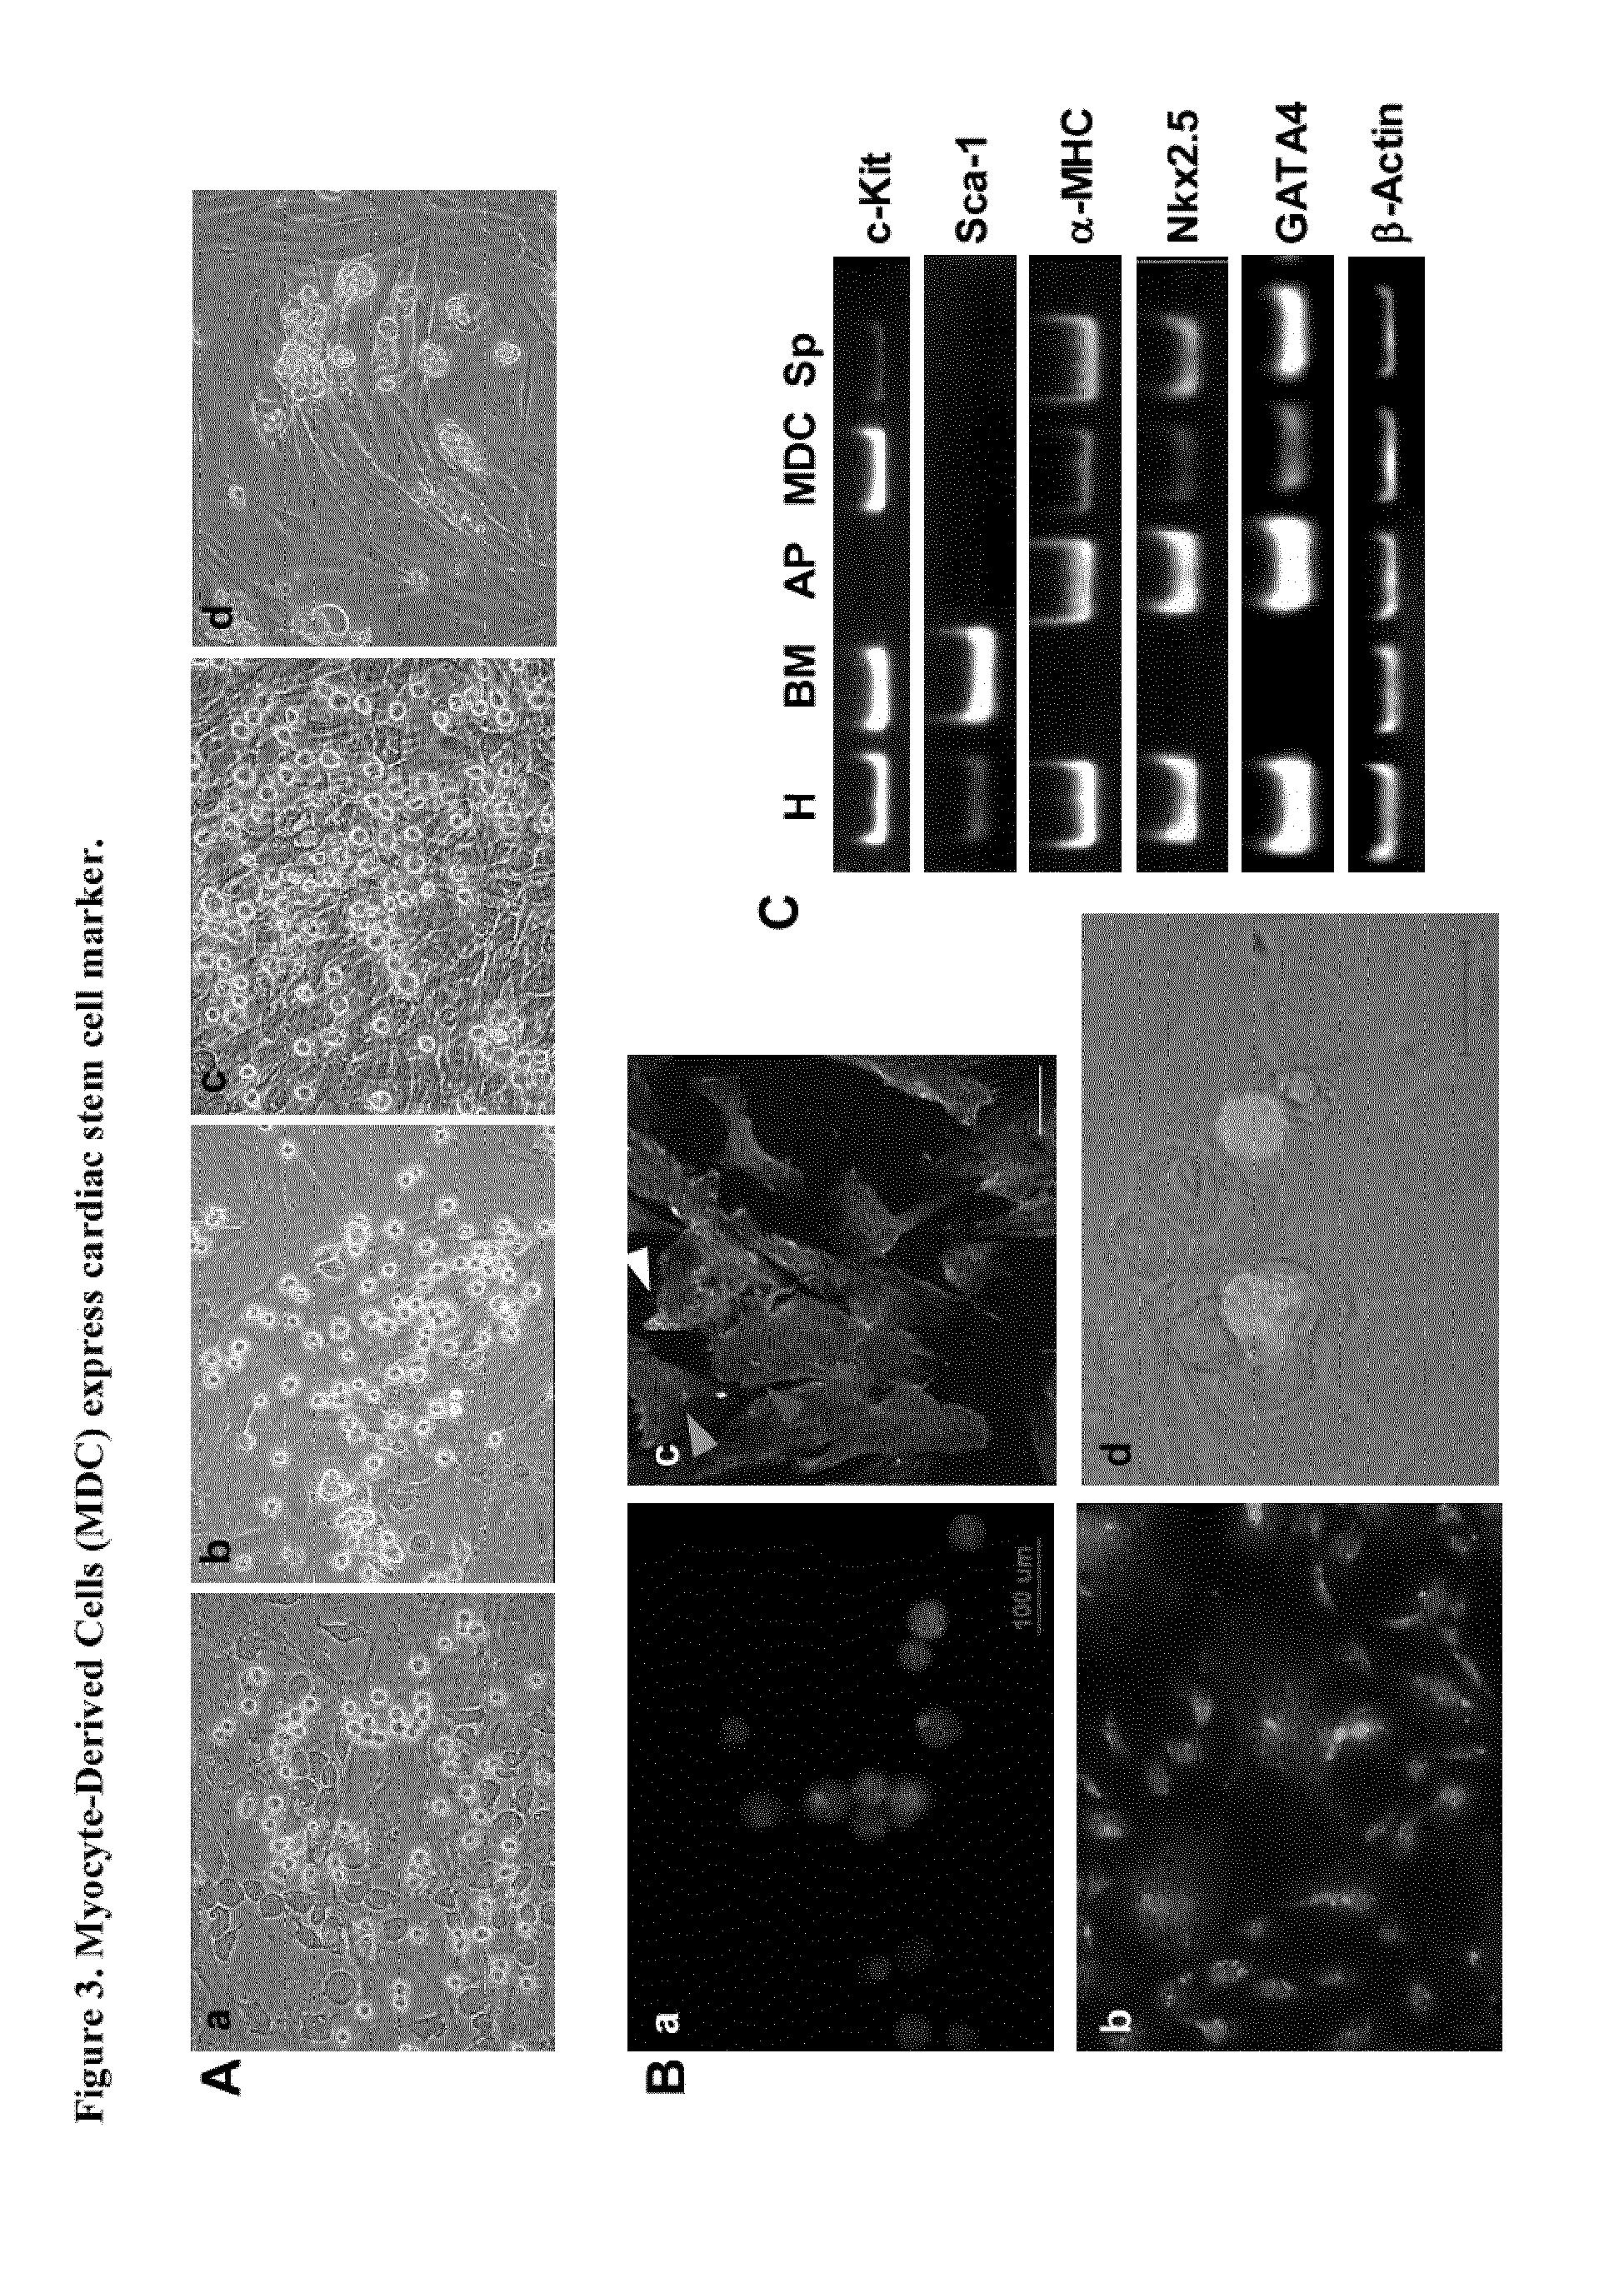 EP2518140A1 - Dedifferentation of adult mammalian